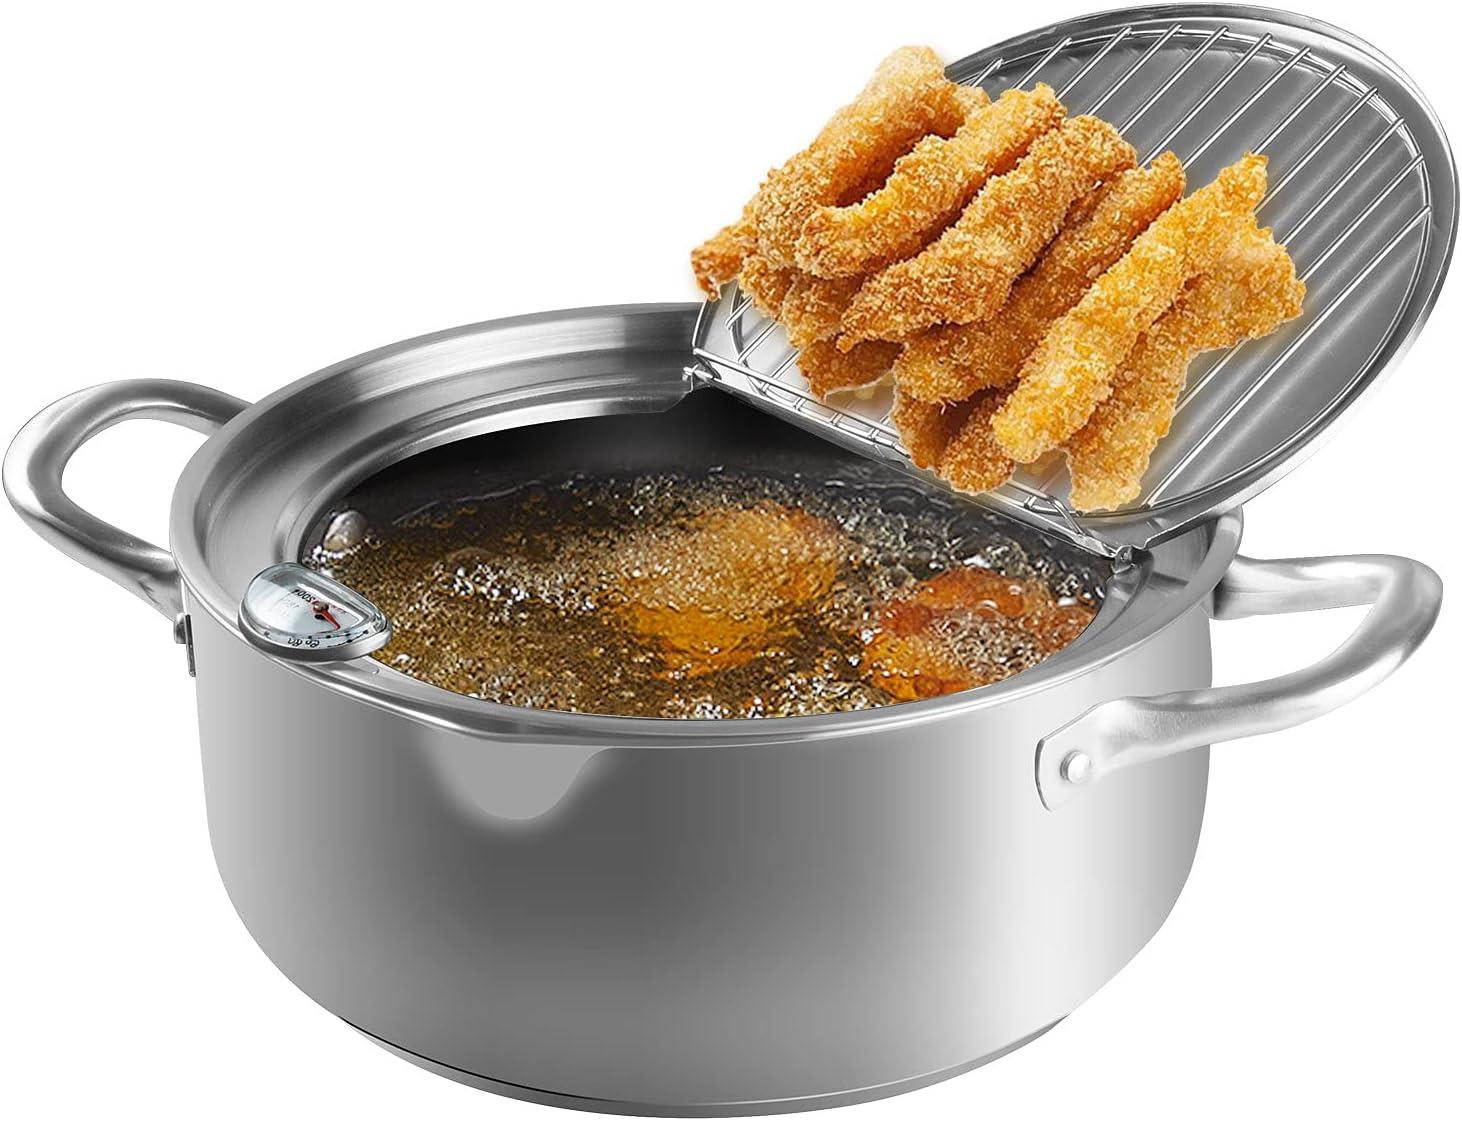 Maocaa Tempura Deep Fry Pot, 304 Stainless Steel Tempura Fryer with Thermometer, Lid Japanese Style Tempura Fryer Pan Uncoated Fryer (9.4)